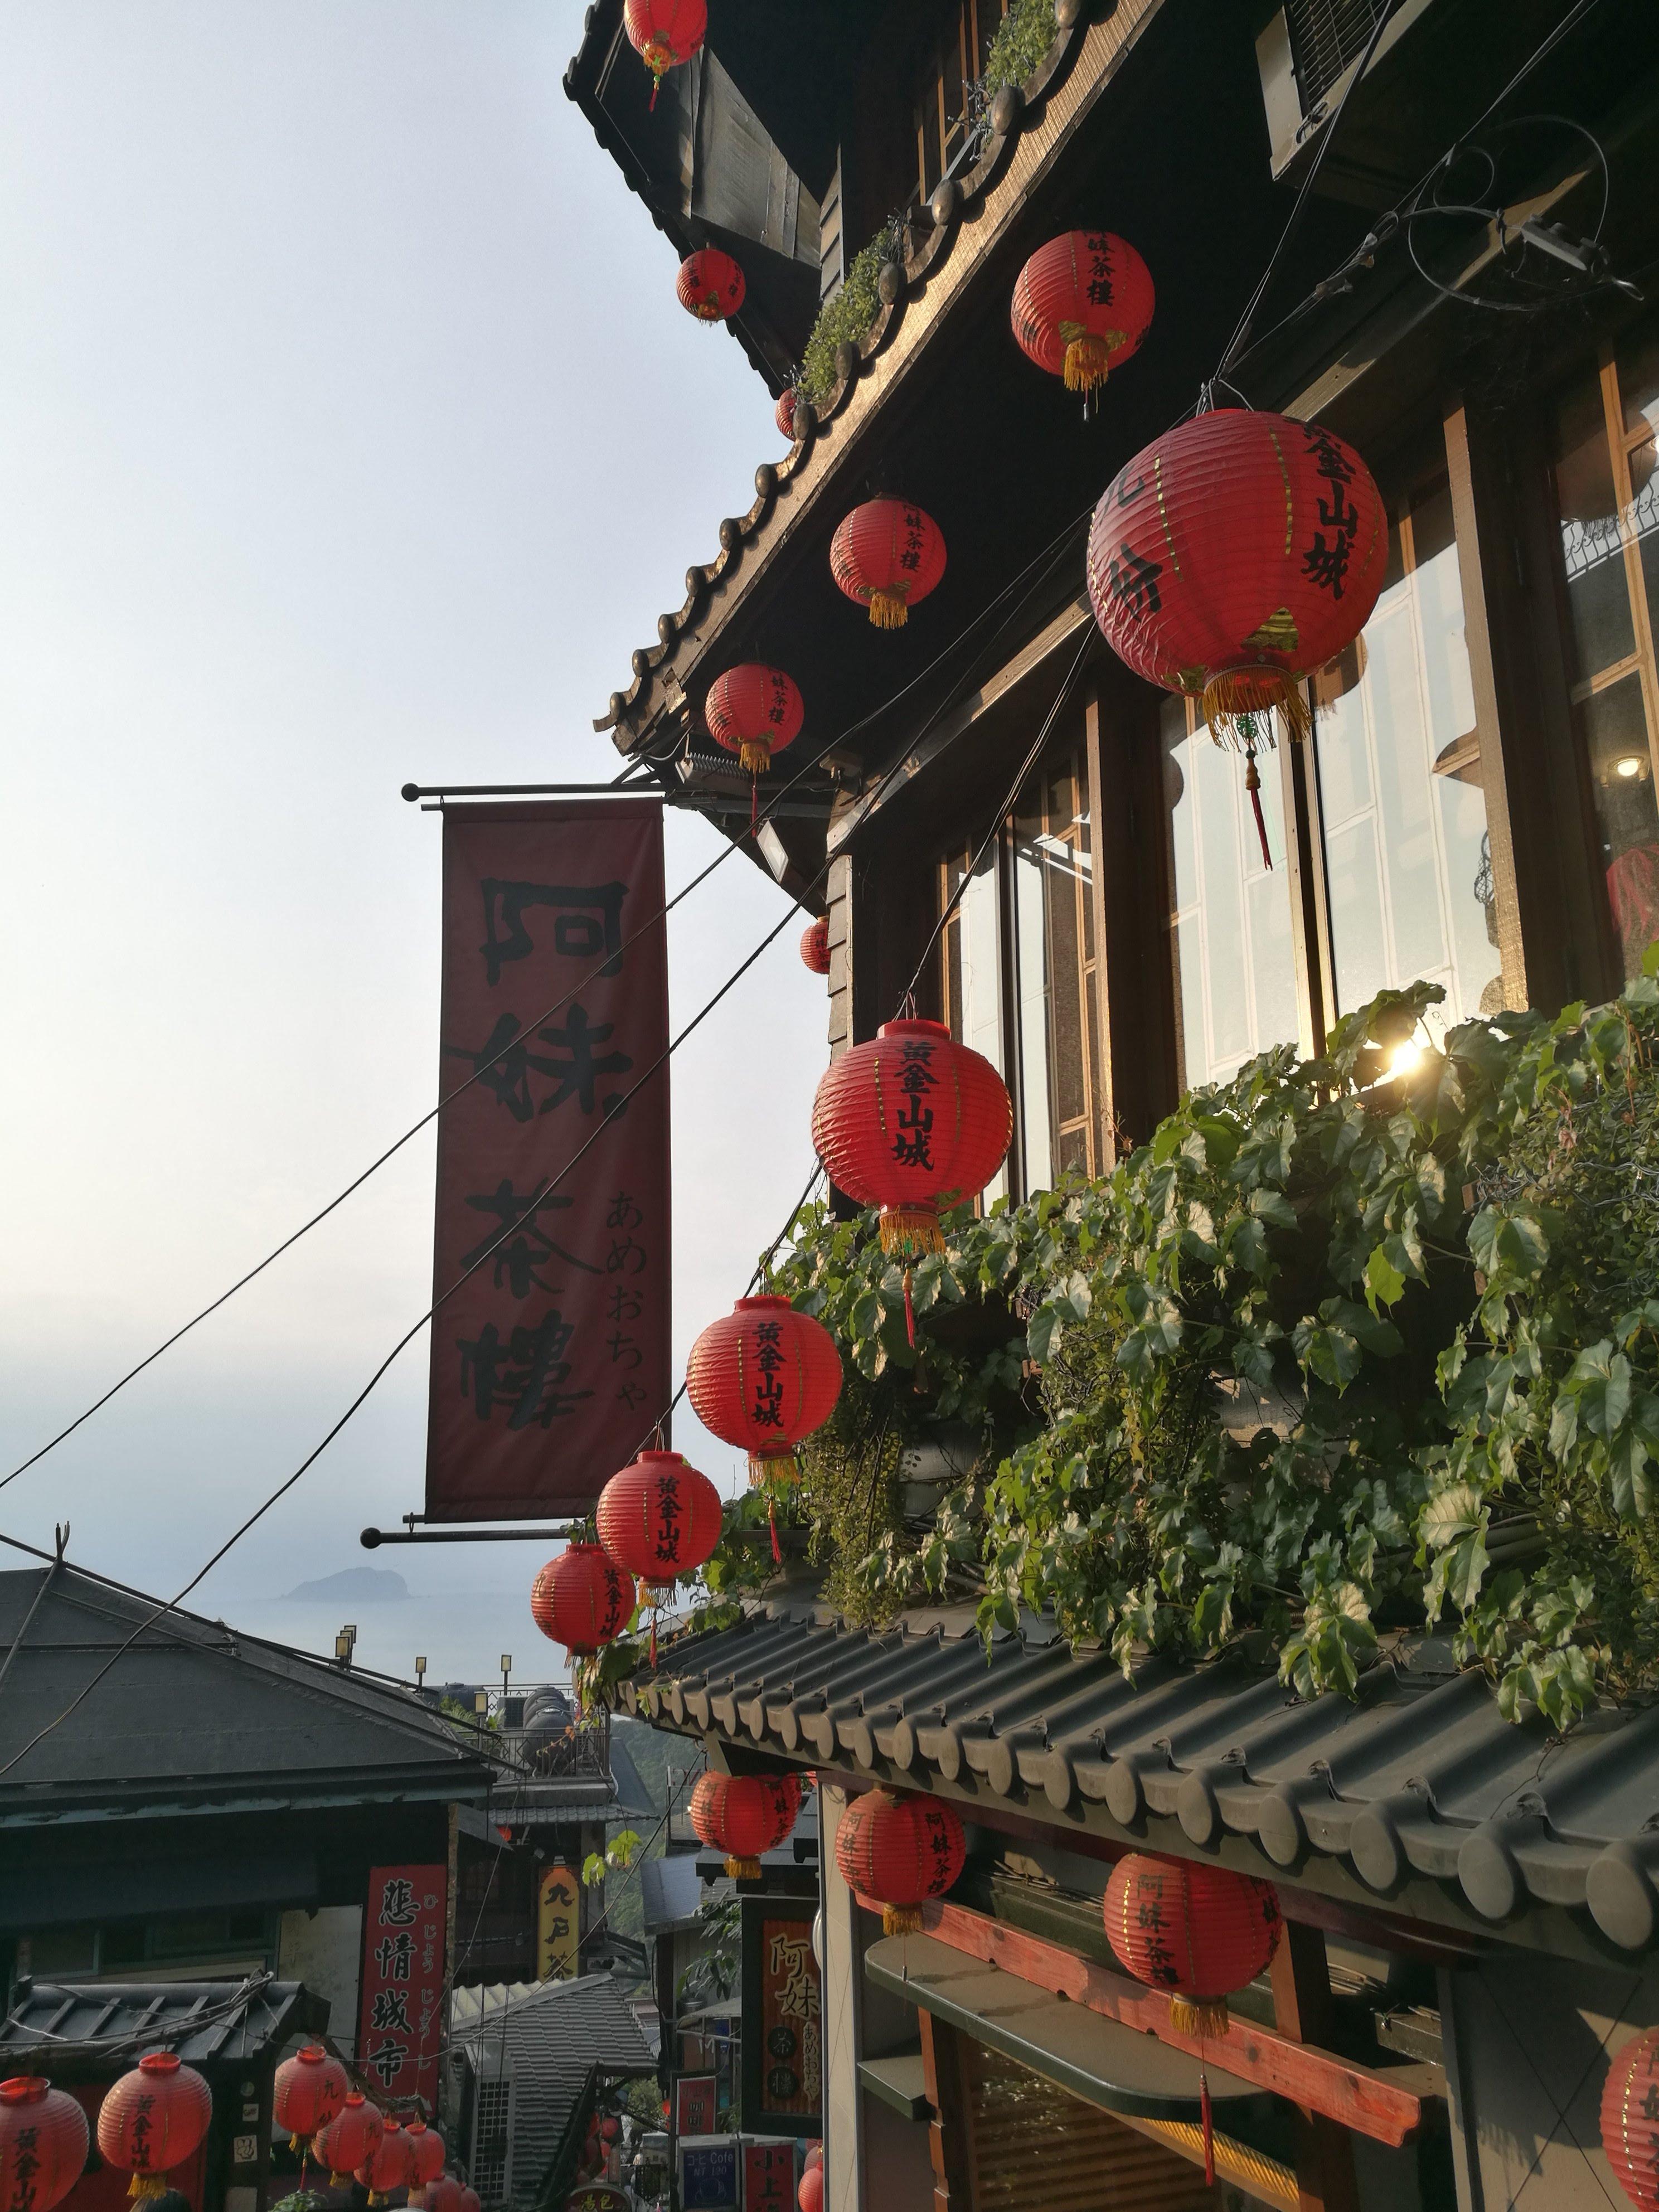 Jiufen Lantern Rooftop | Taiwan 2018